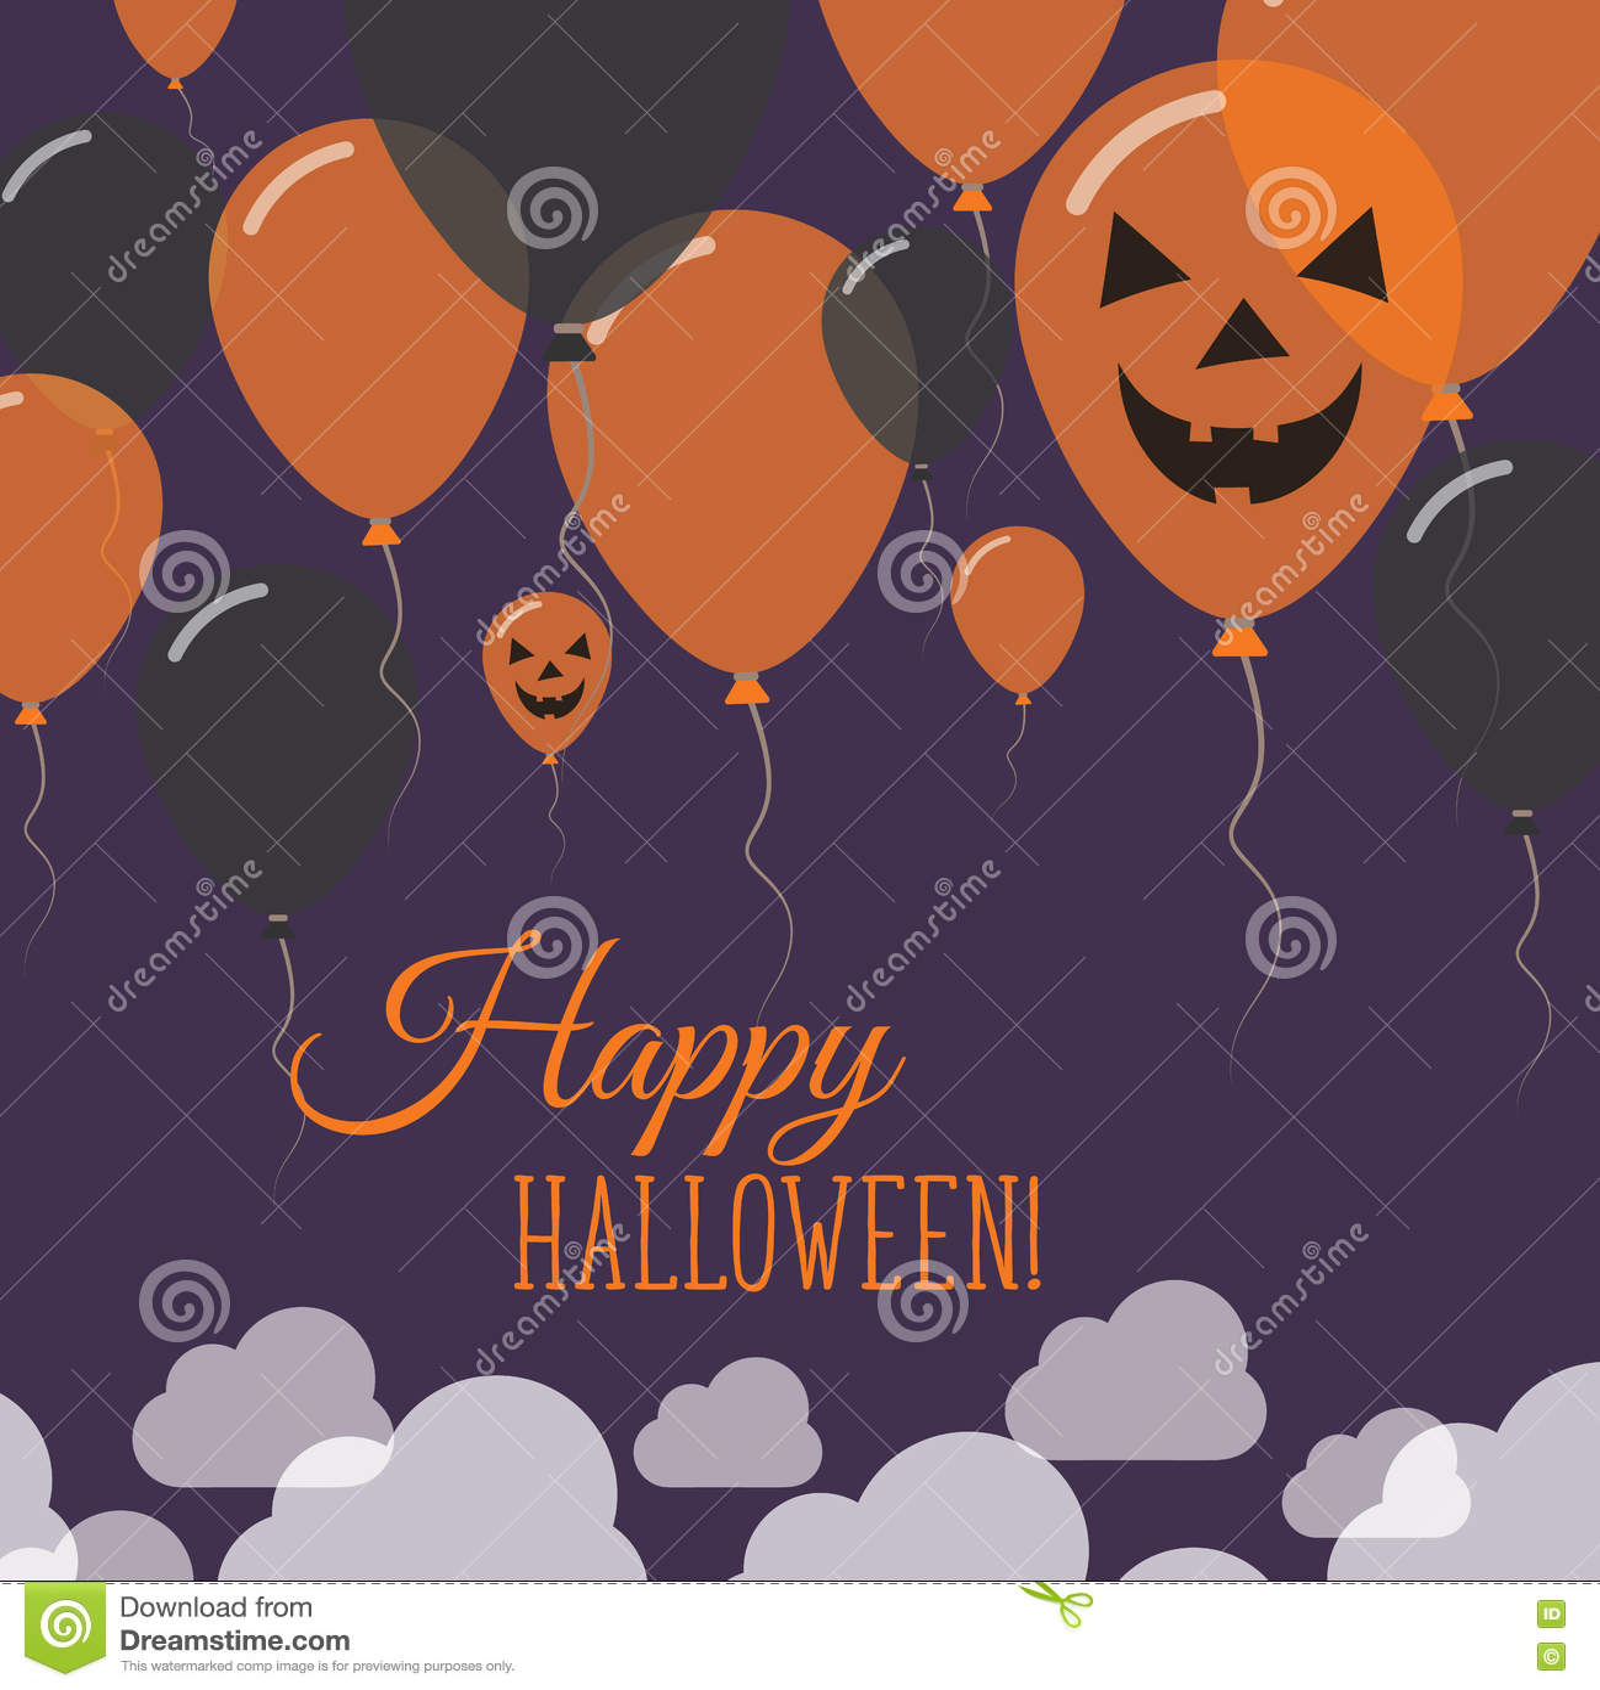 Halloween Balloons Flat Top Greeting Card Stock Vector